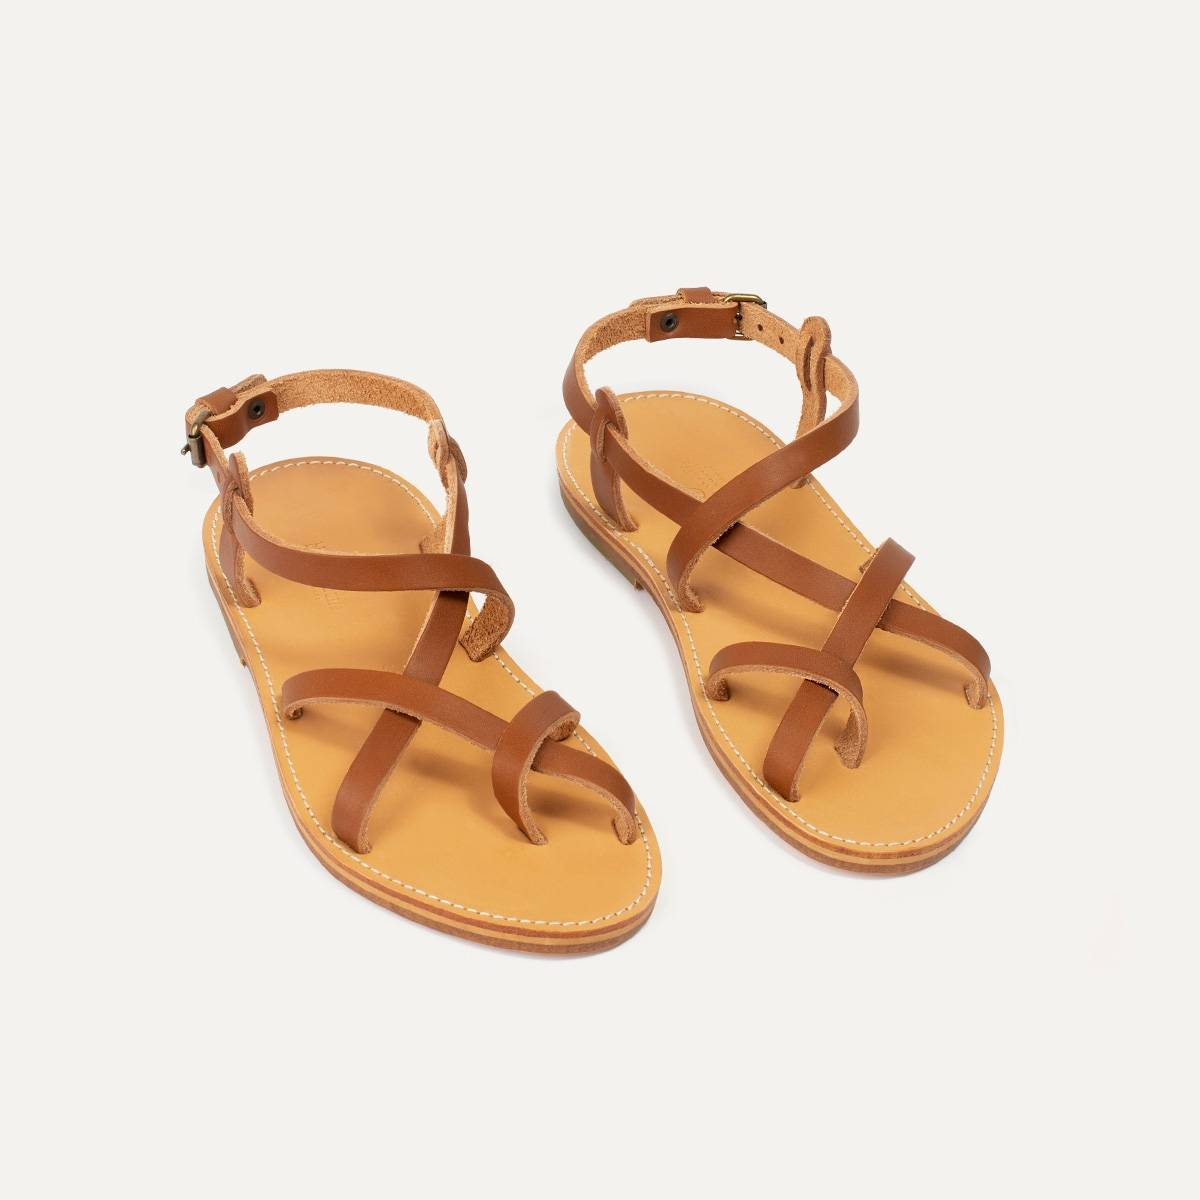 Nara leather sandals - Pain Brûlé (image n°4)